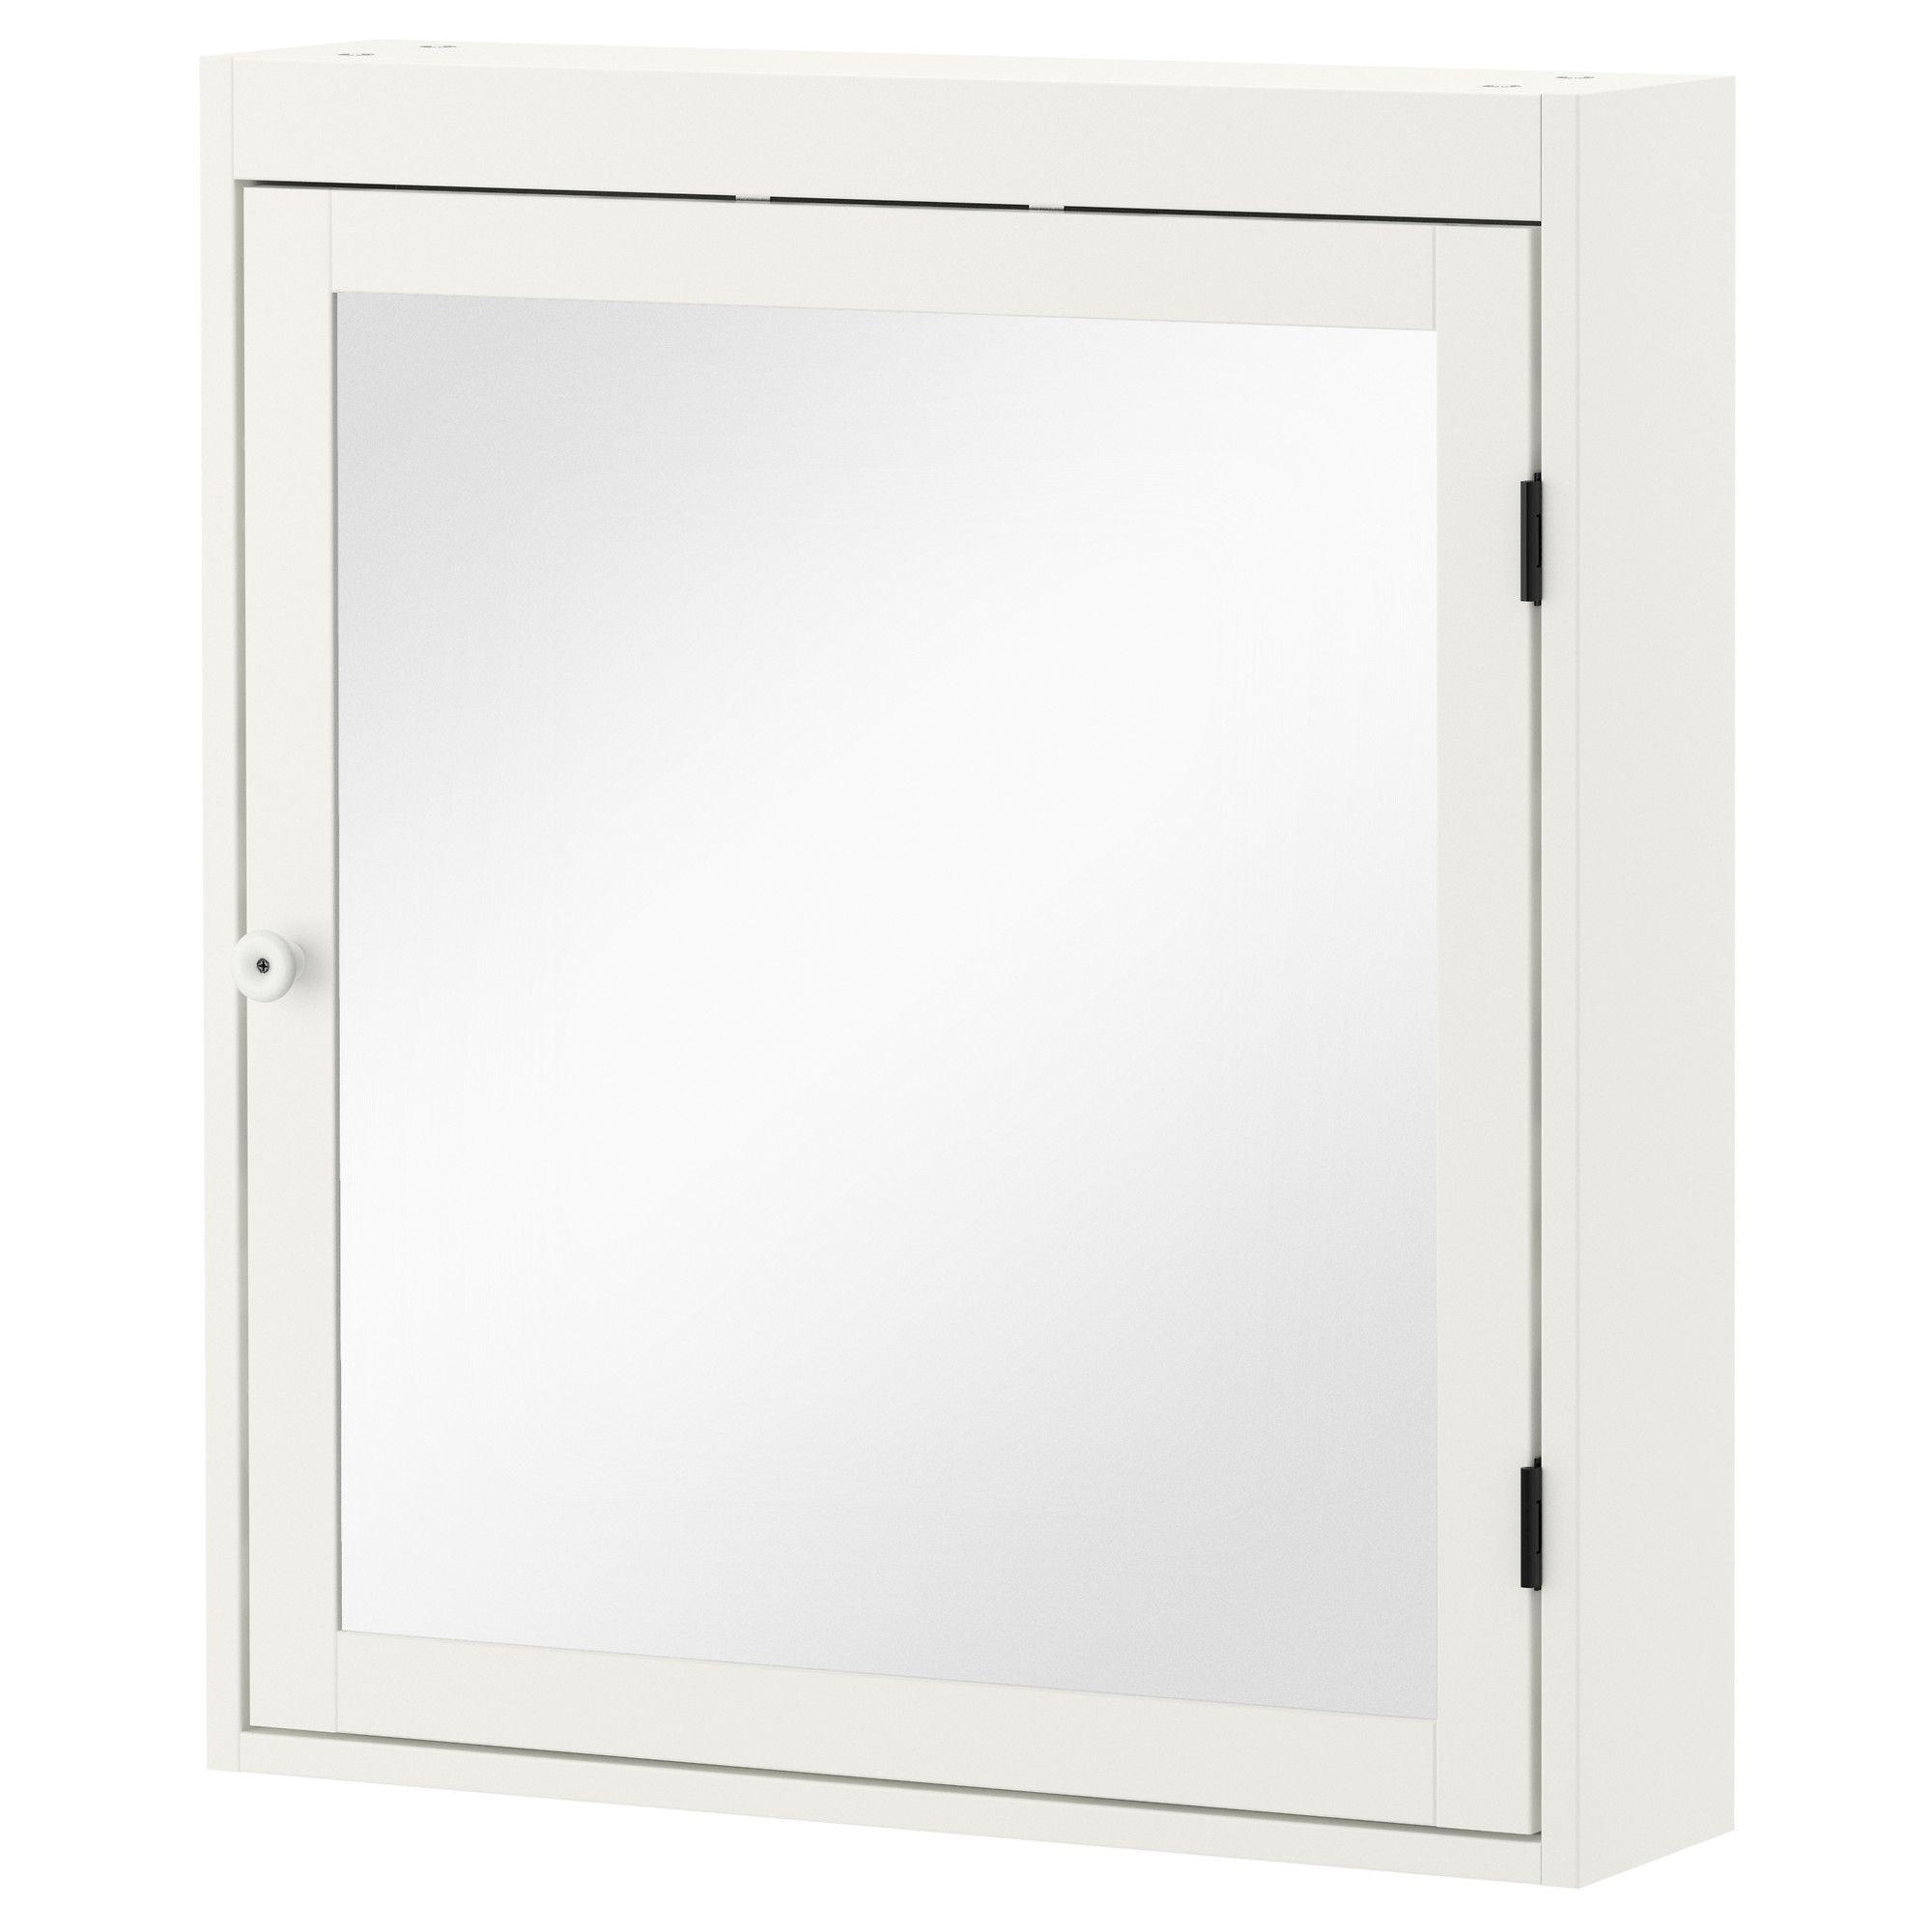 #6D6D5E Perfect Dimension For Bathroom Turn Mirror Into  2609 Petite Poubelle Salle De Bain Ikea 2000x2000 px @ aertt.com